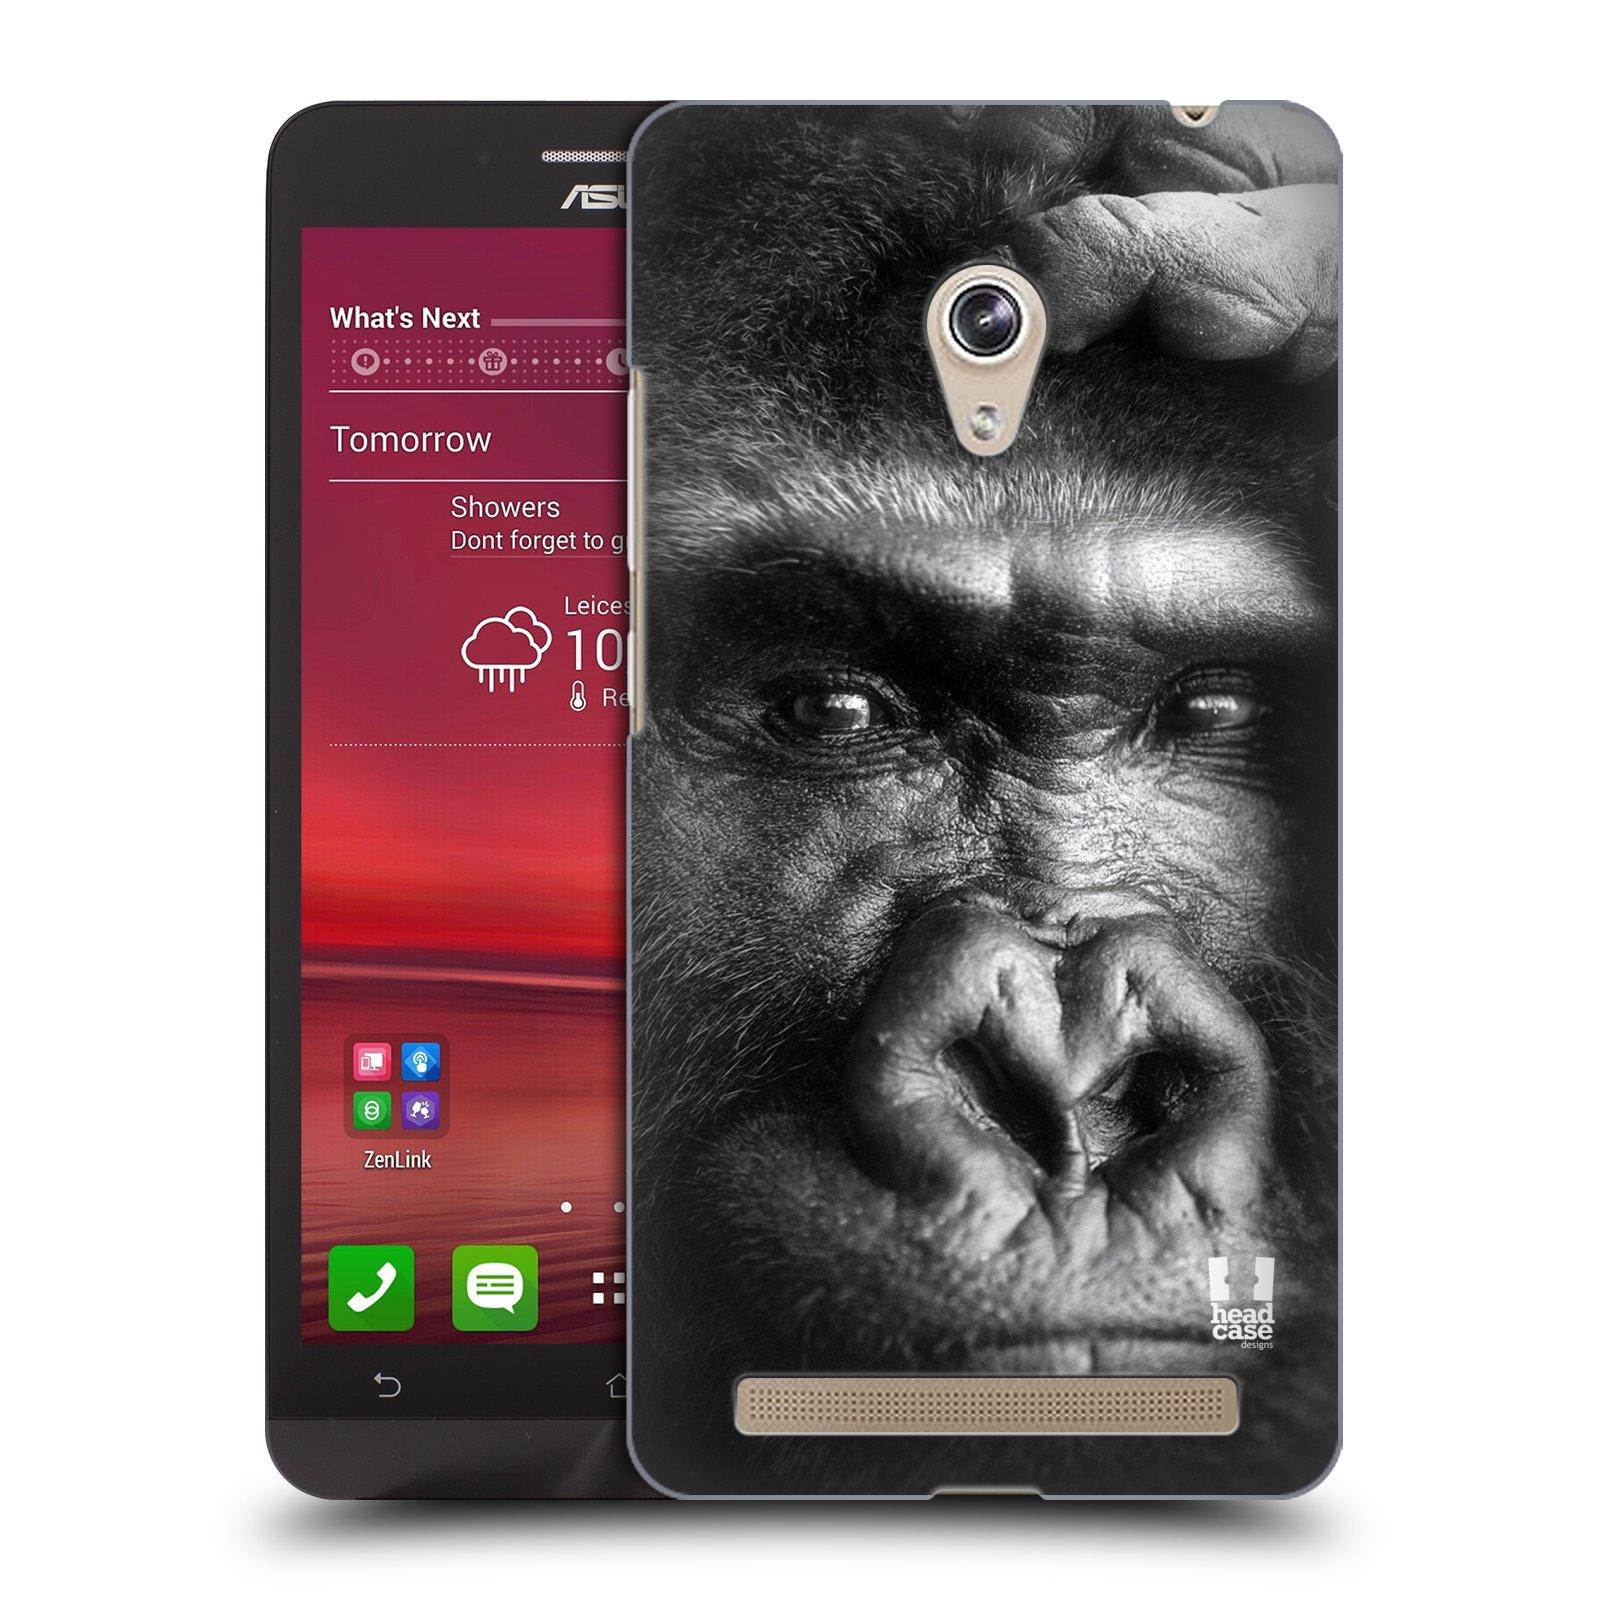 HEAD CASE plastový obal na mobil Asus Zenfone 6 vzor Divočina, Divoký život a zvířata foto GORILA TVÁŘ